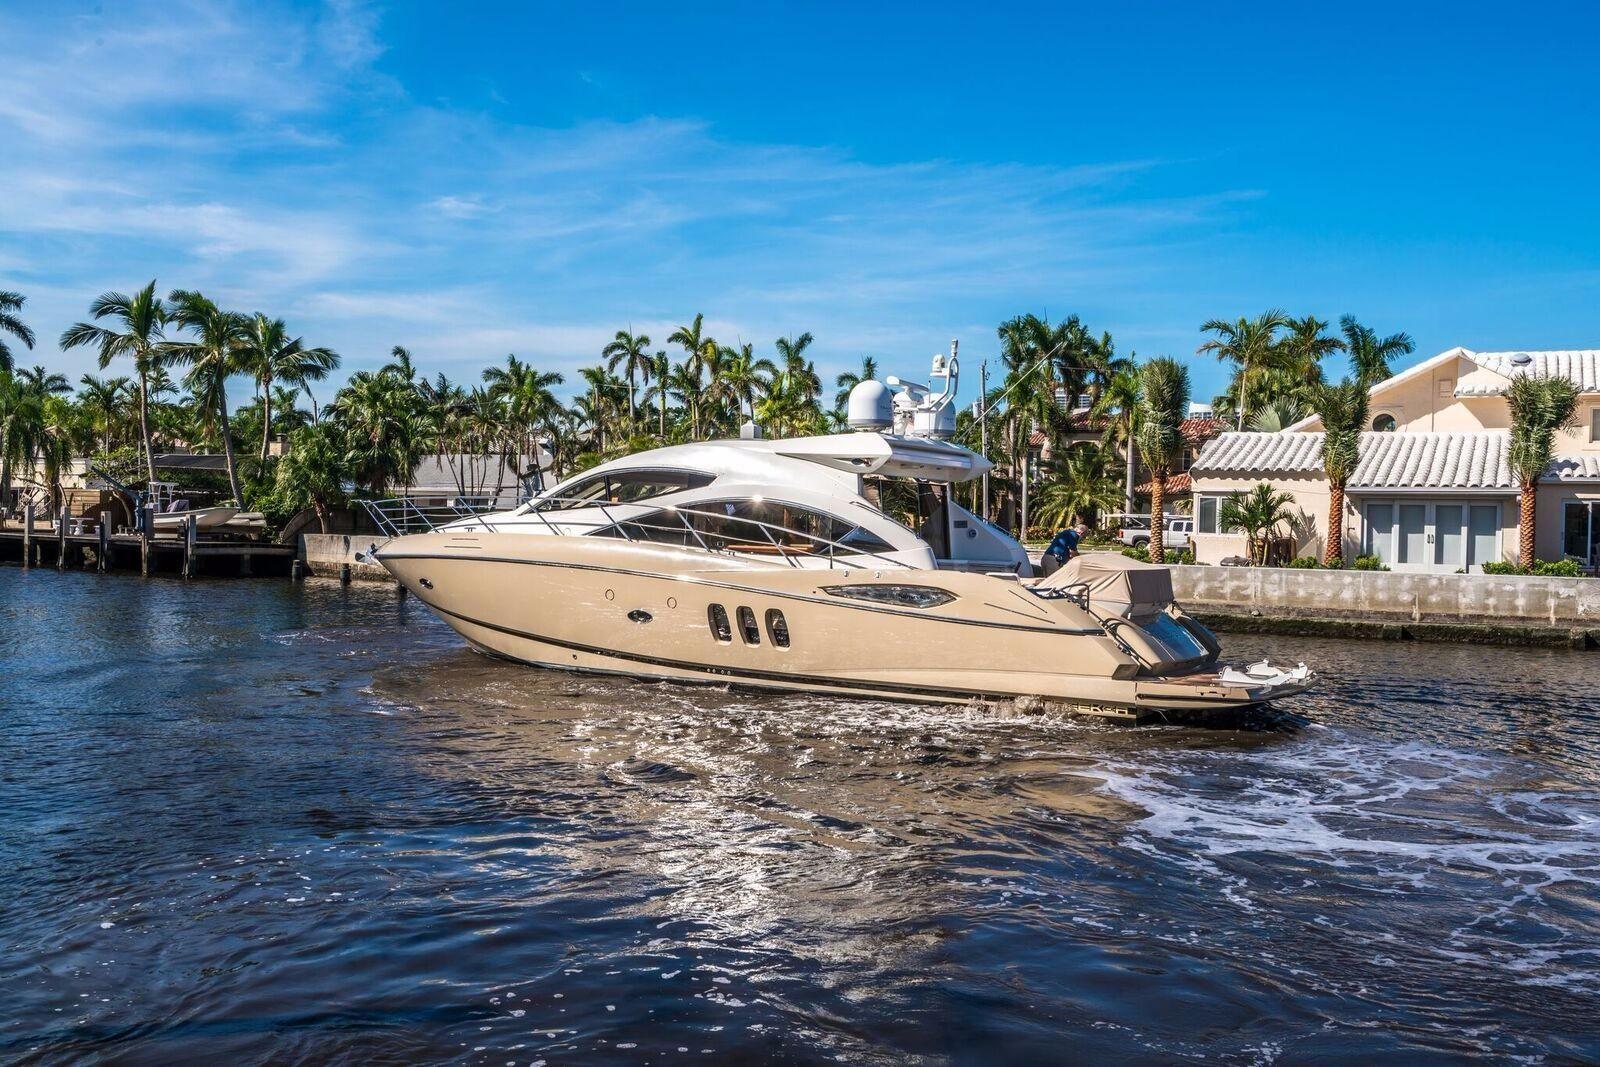 52 Ft 2010 Sunseeker Predator Yacht For Sale Miami Yacht Show 2018